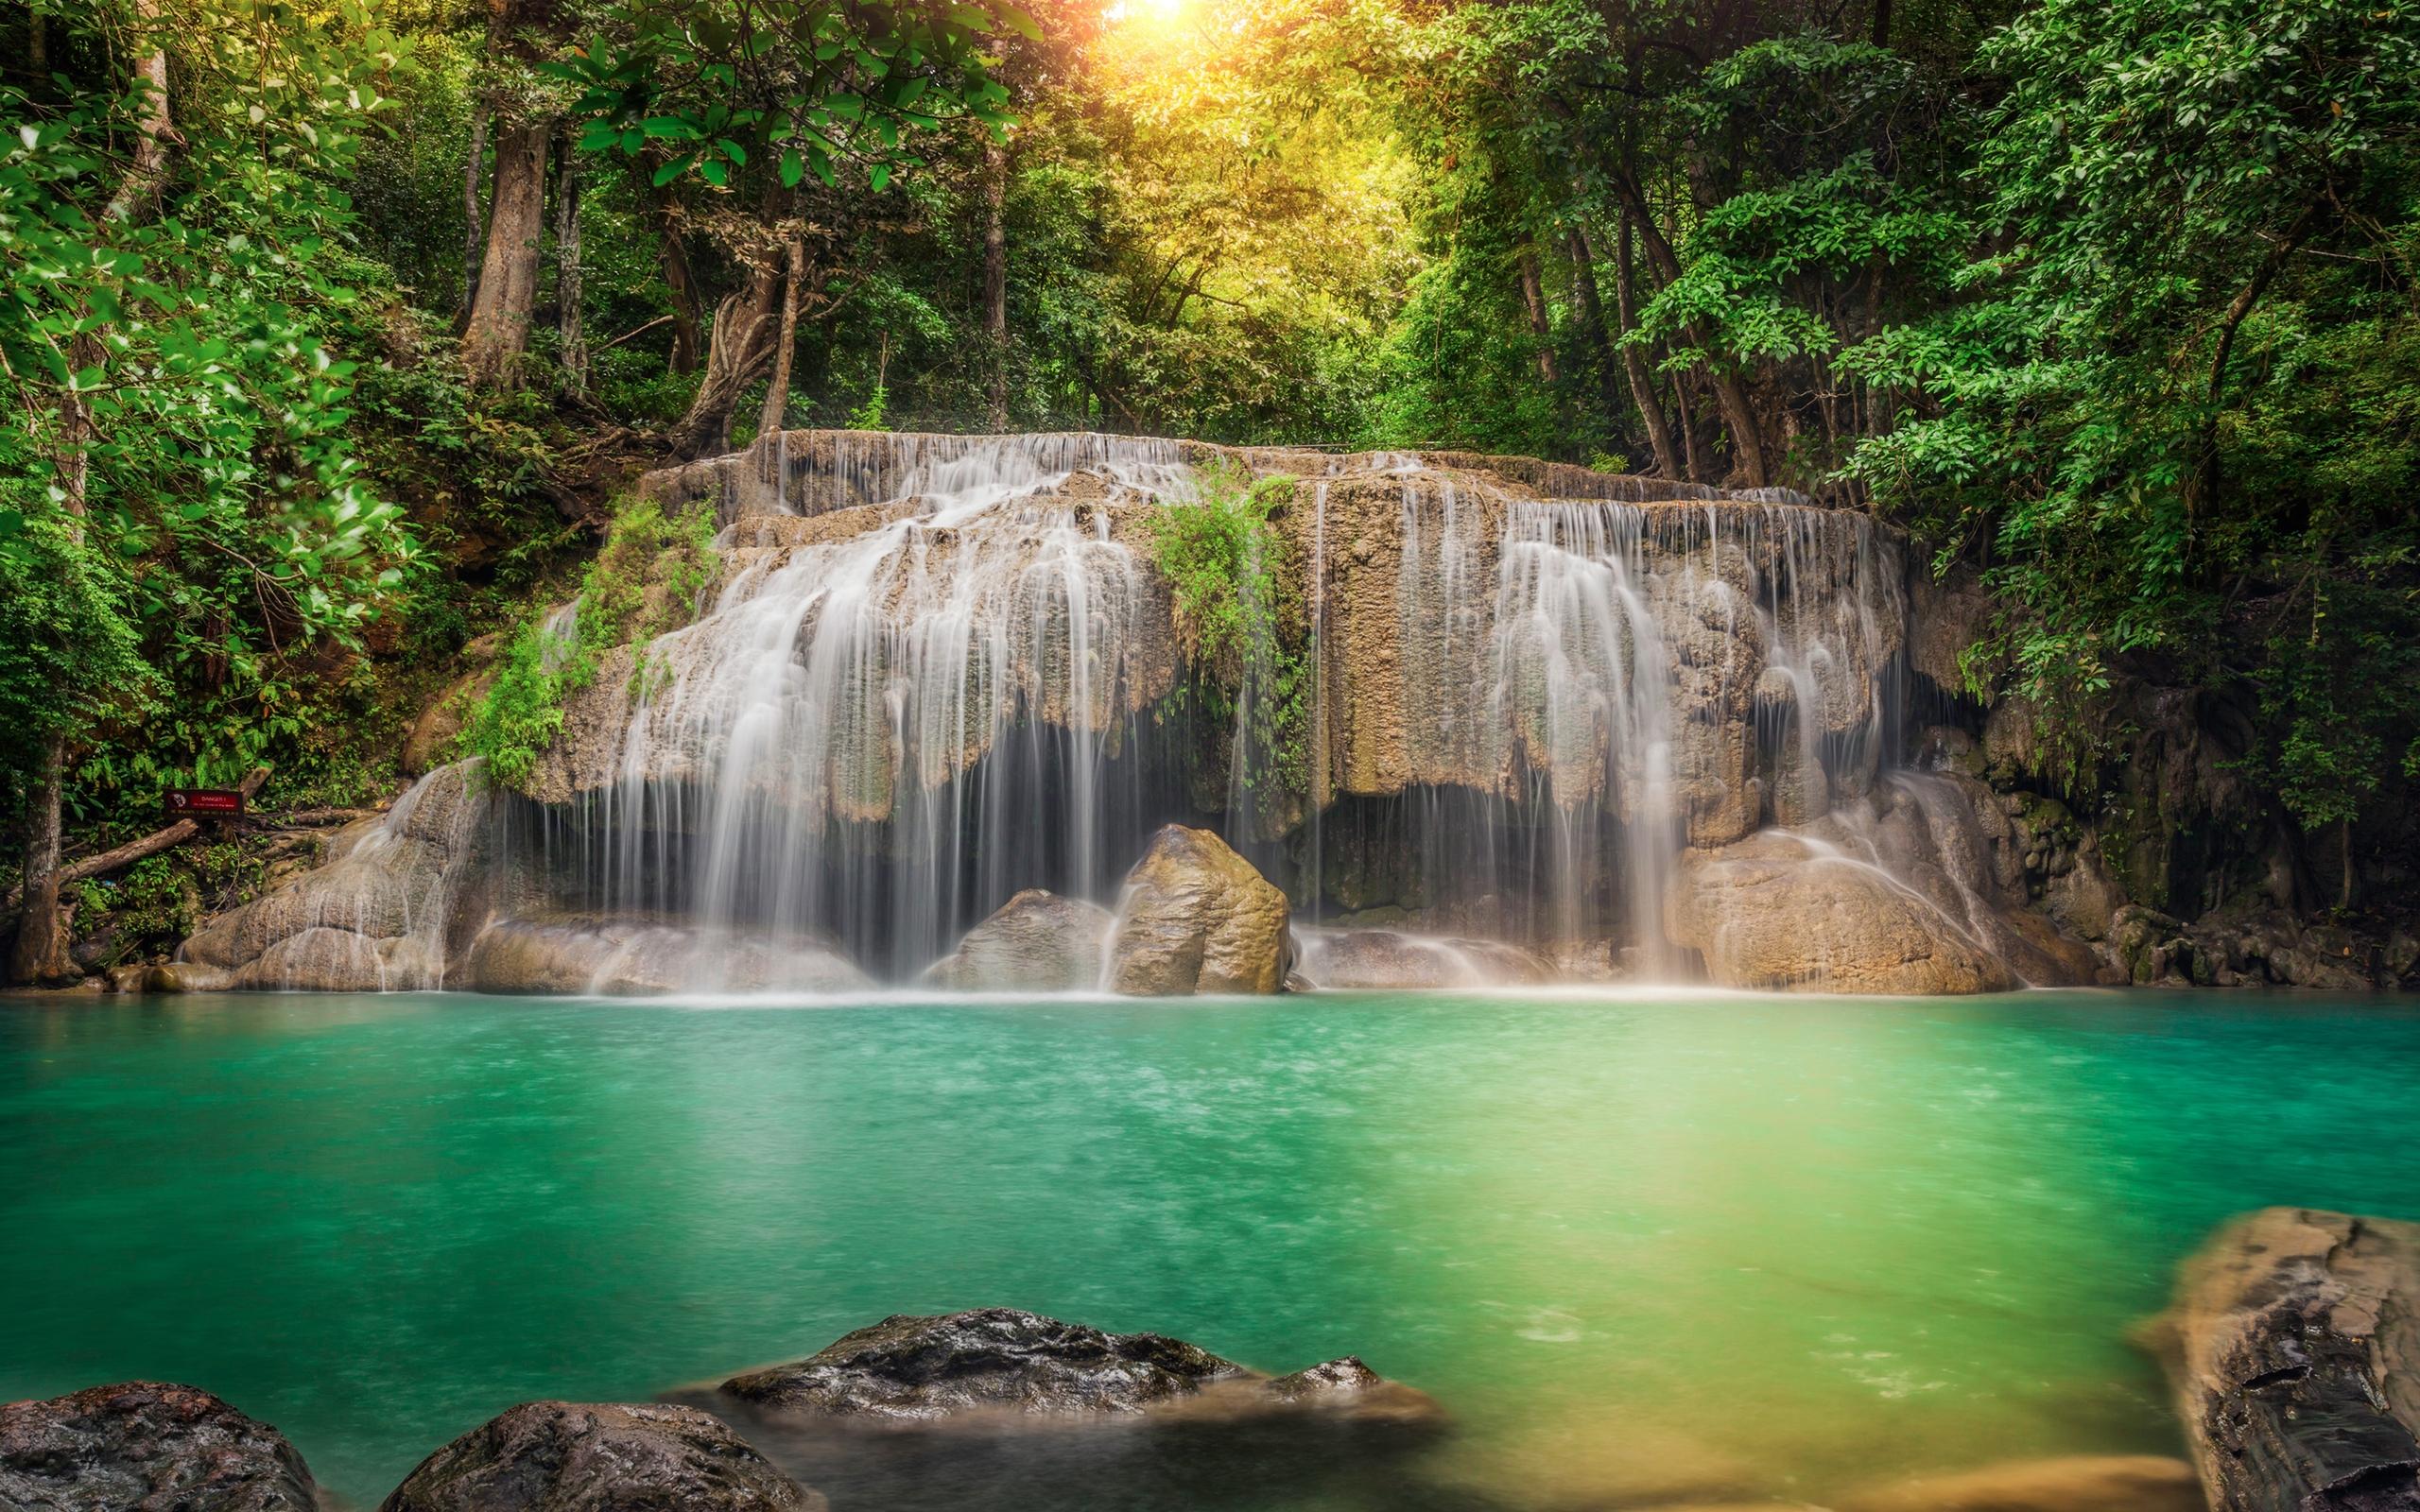 Iguazu Falls Wallpaper Thailand Stream Cascade Rocks Jungles Waterfalls Forest